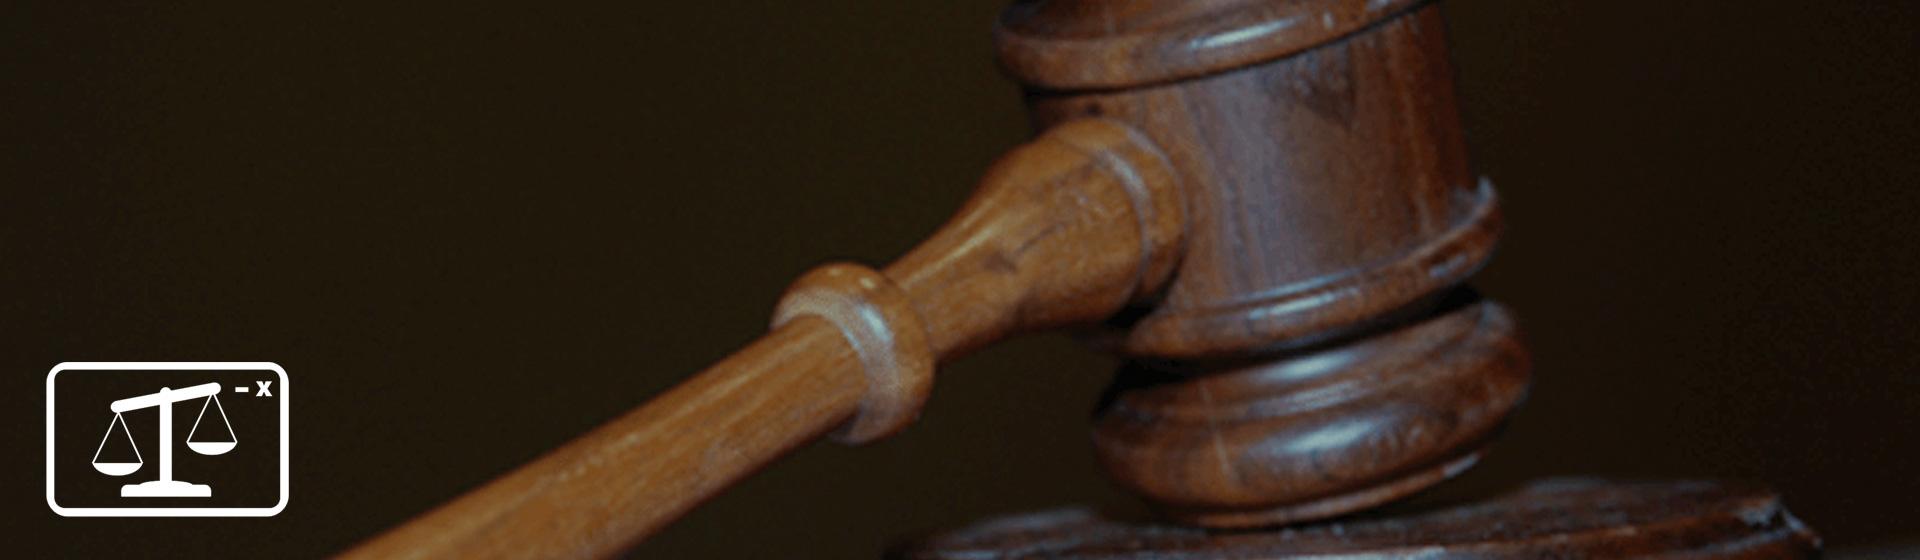 Bg aspectos juridicos